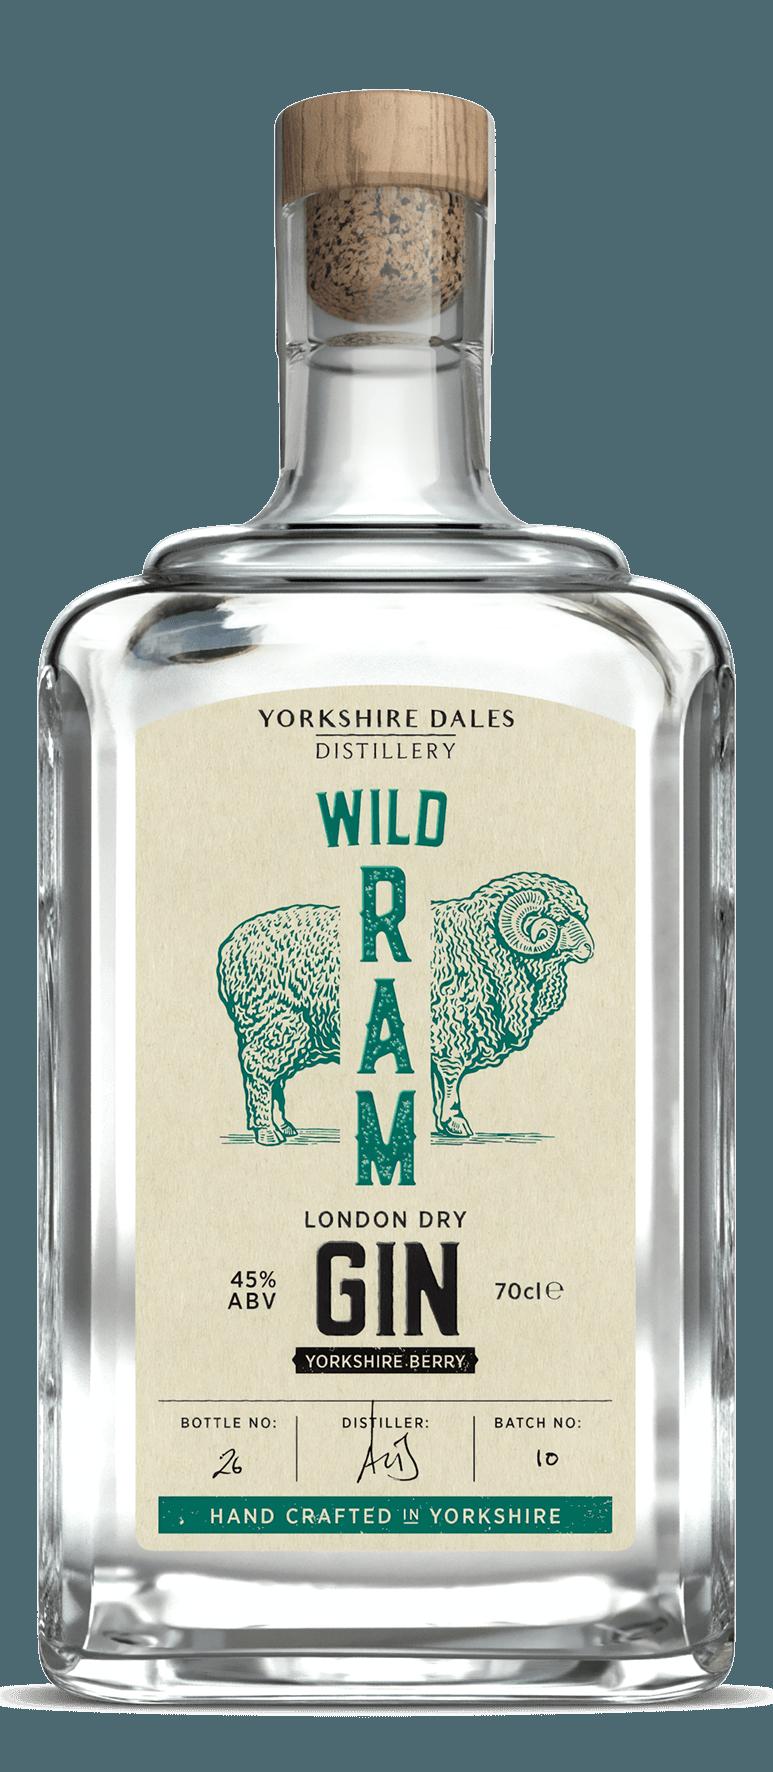 Image 0: Wild Ram Yorkshire Berry London Dry Gin